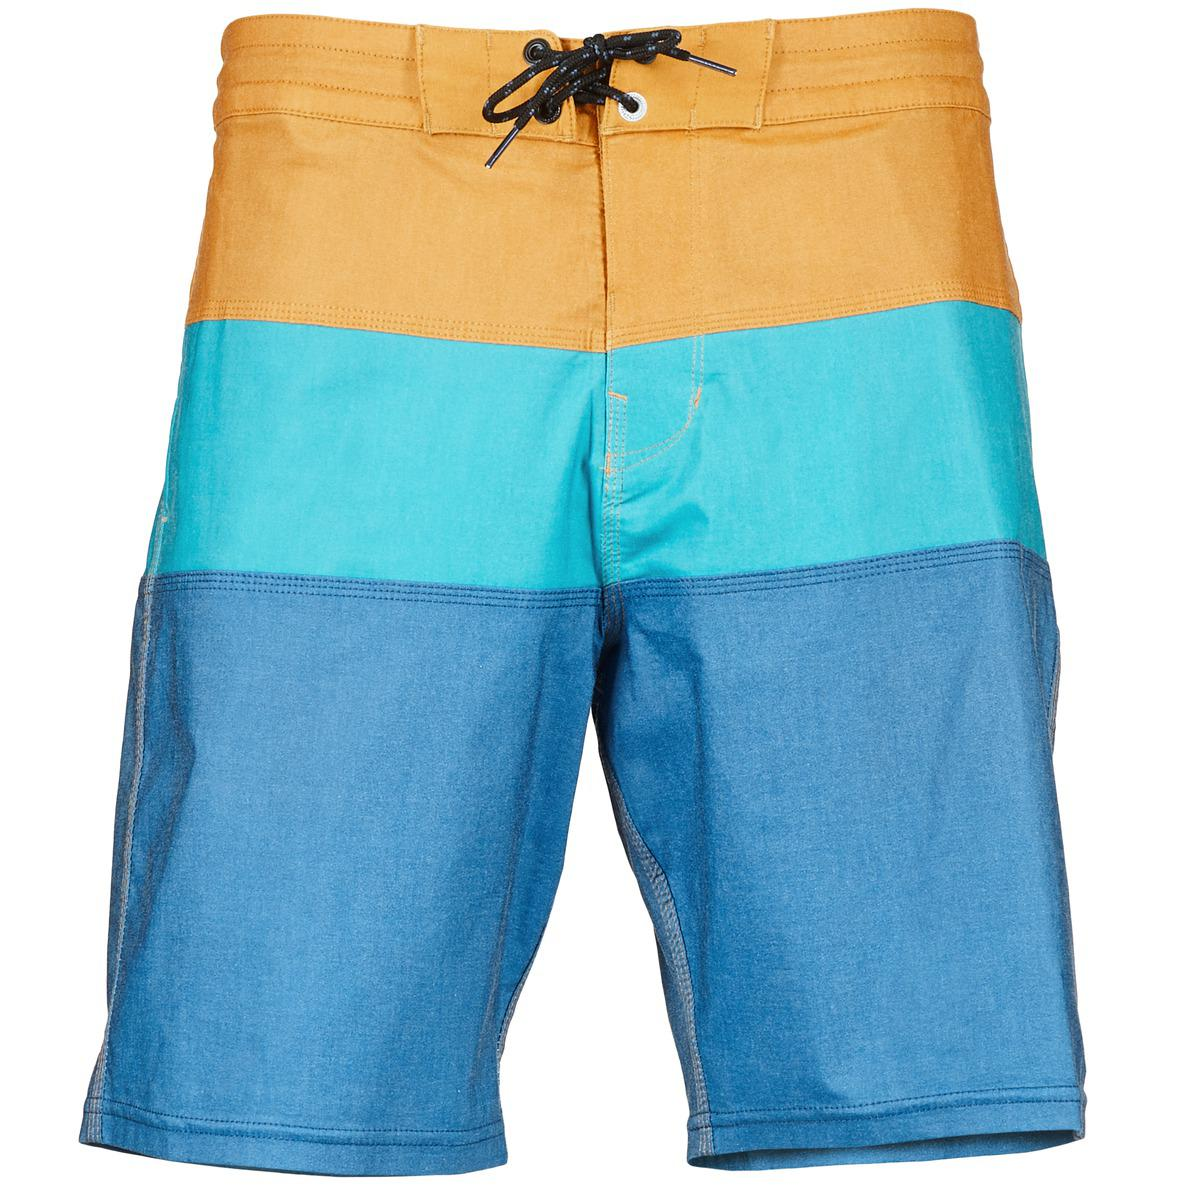 Billabong Tribong Lo Tides Men s In Multicolour in Blue for Men - Lyst 7e3dd5153ea